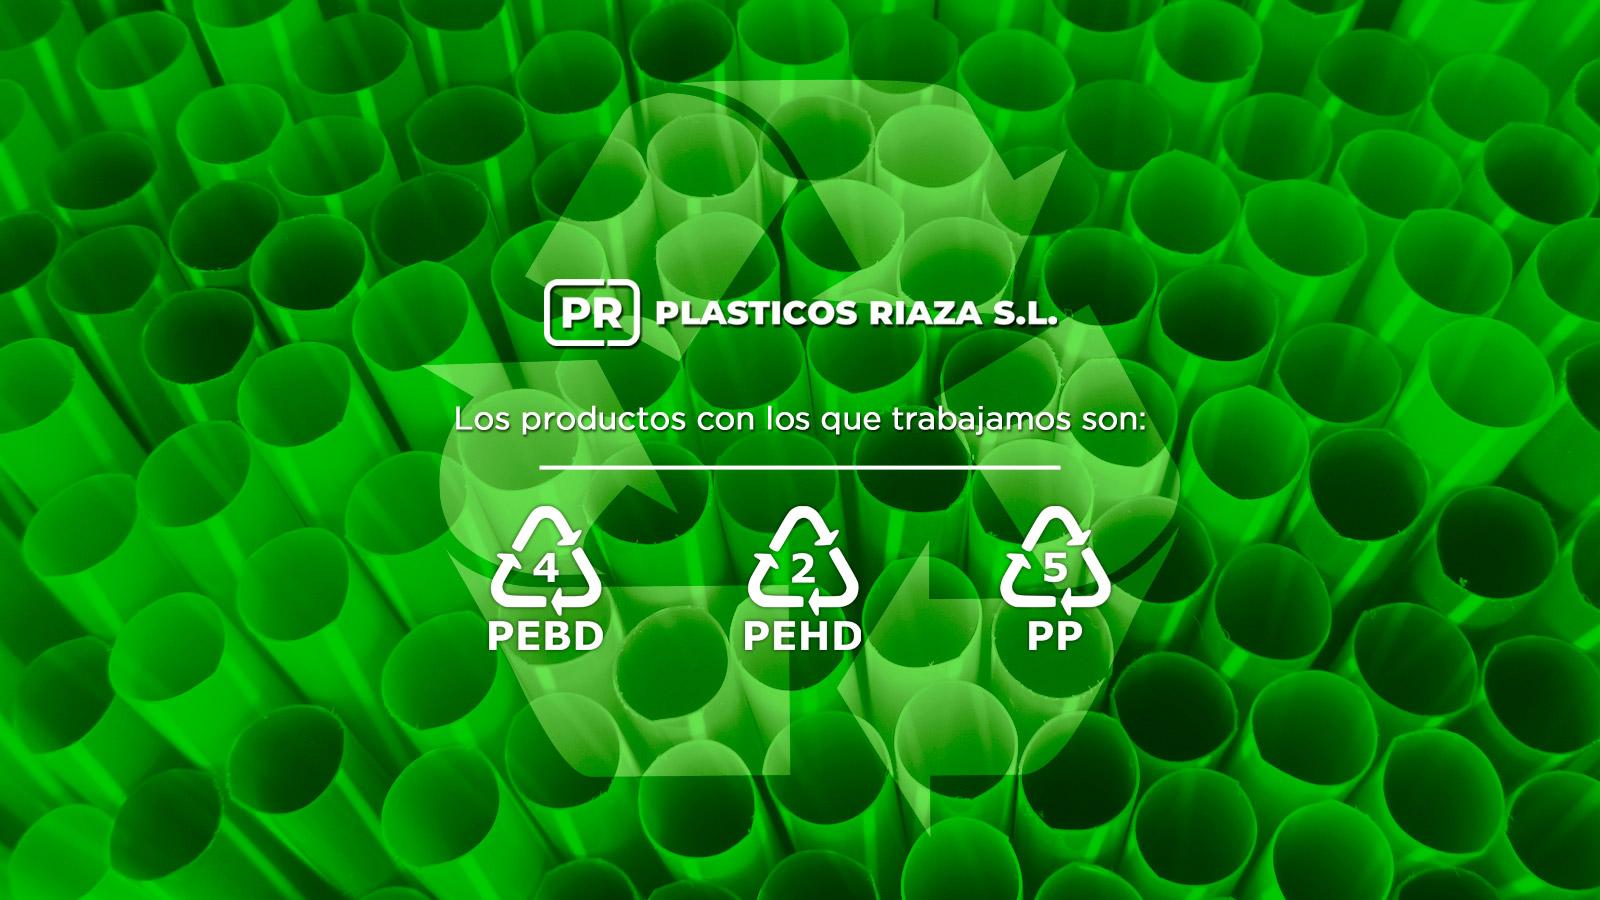 Plasticos Riaza